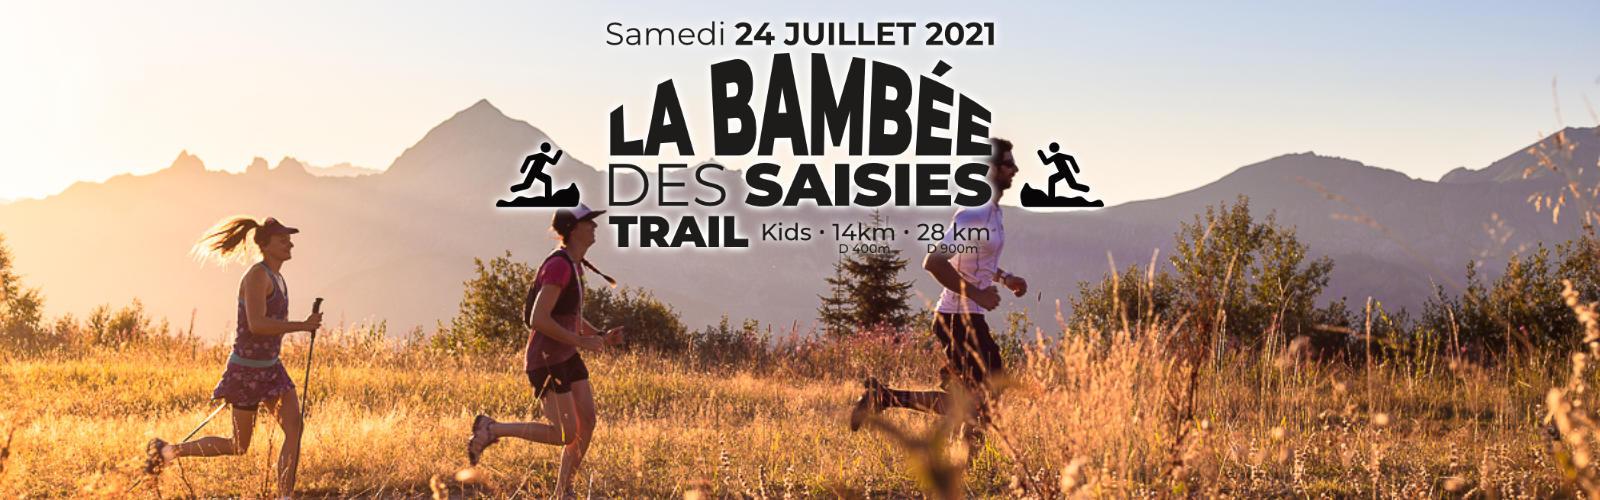 bambee-2491